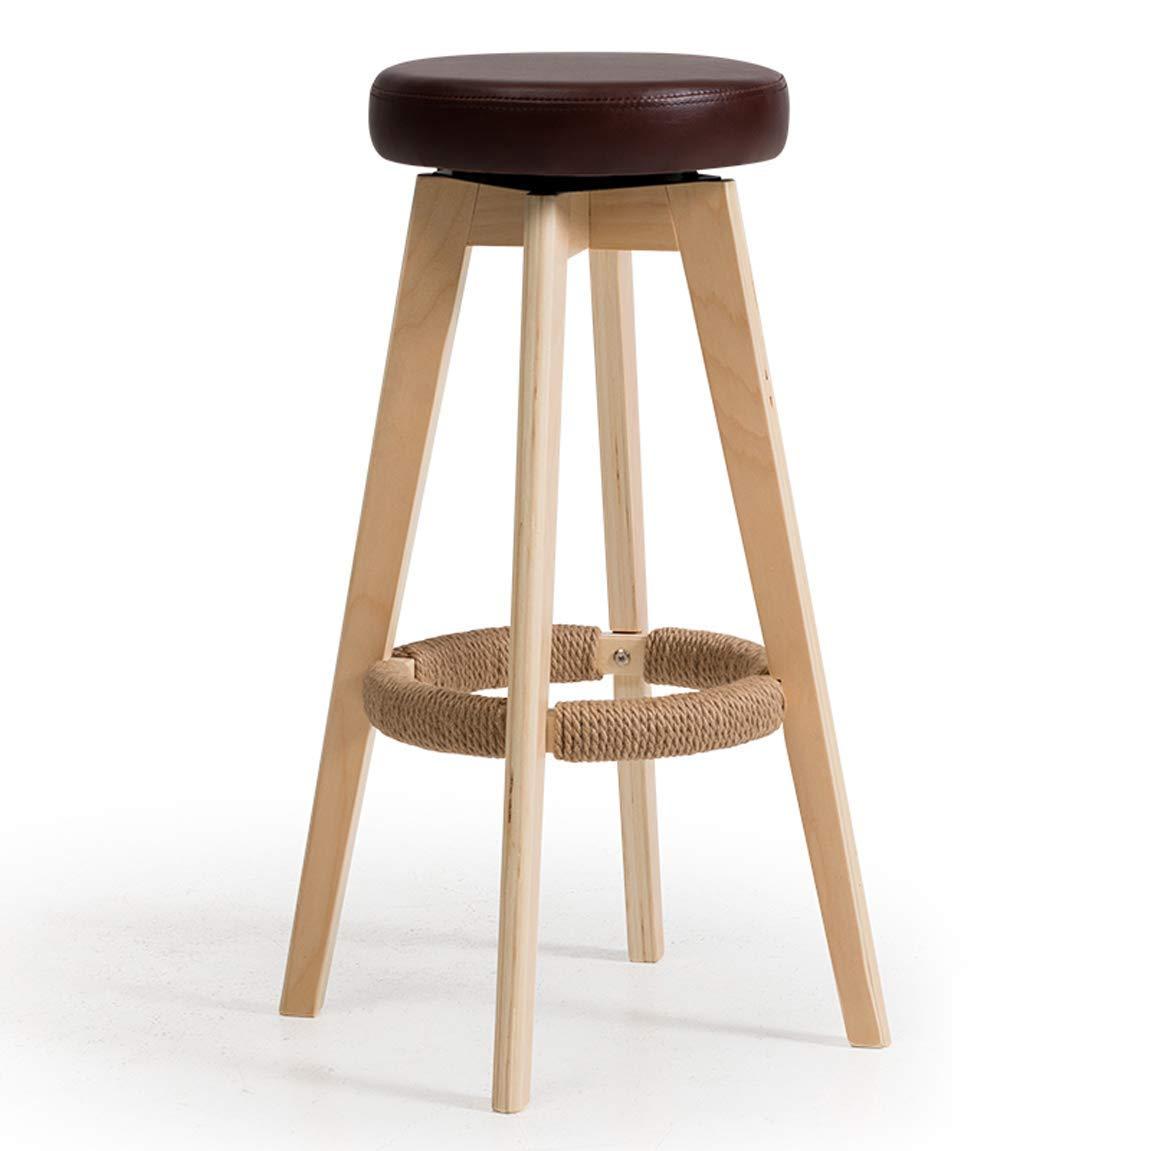 Carl Artbay Bar Chair Bar Chair High Stand Household Solid Wood Bar Stand Modern Simple redary Creative European Chair 74 cm High 6 Strong and Practical